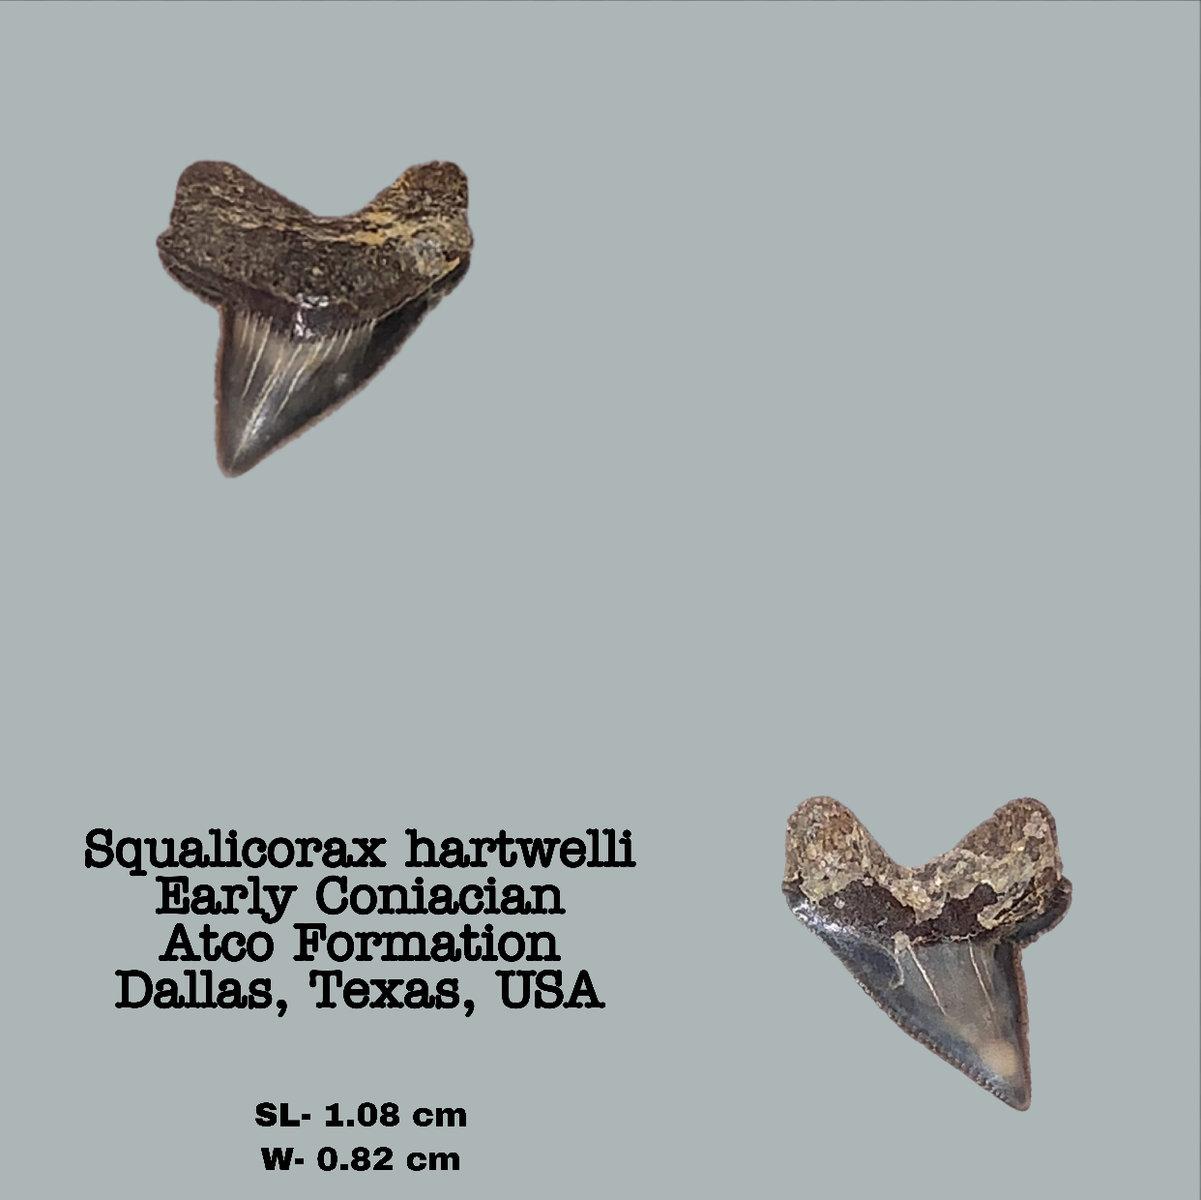 Squalicorax hartwelli